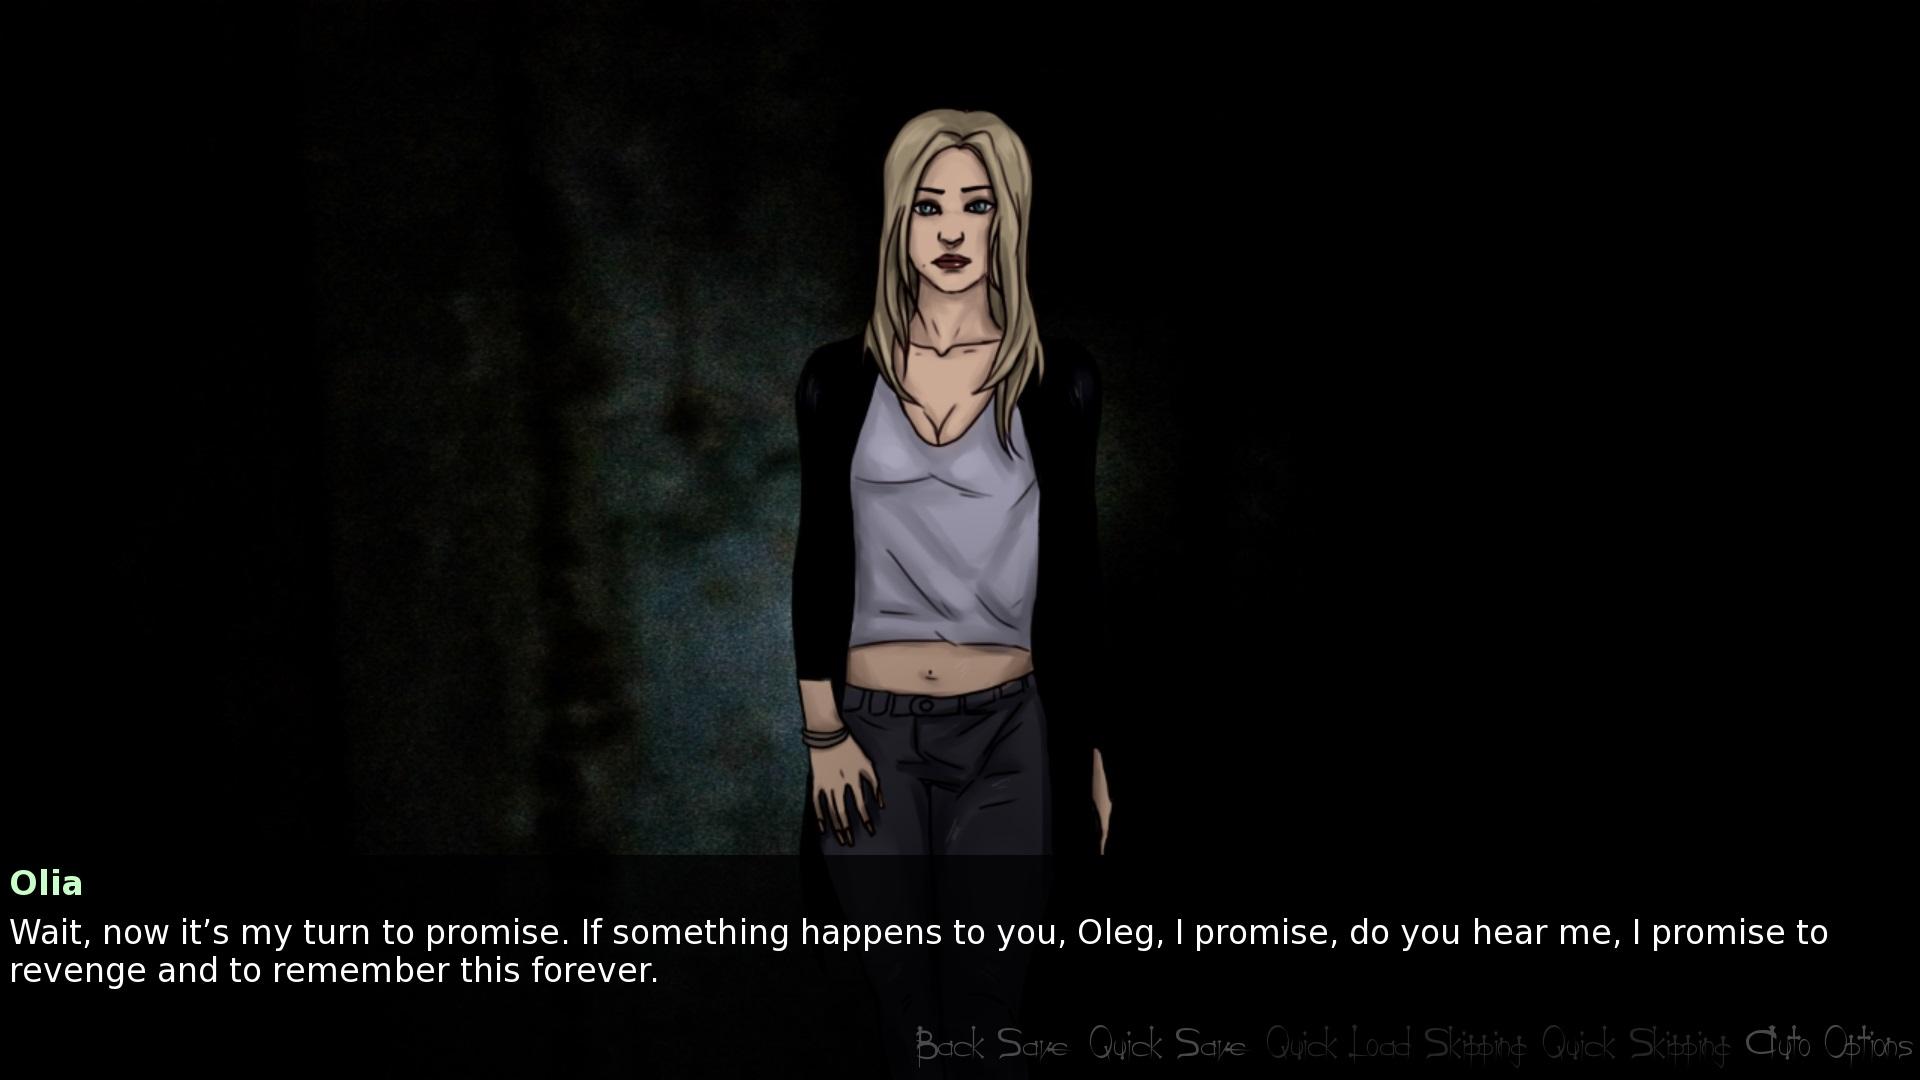 The Agony screenshot